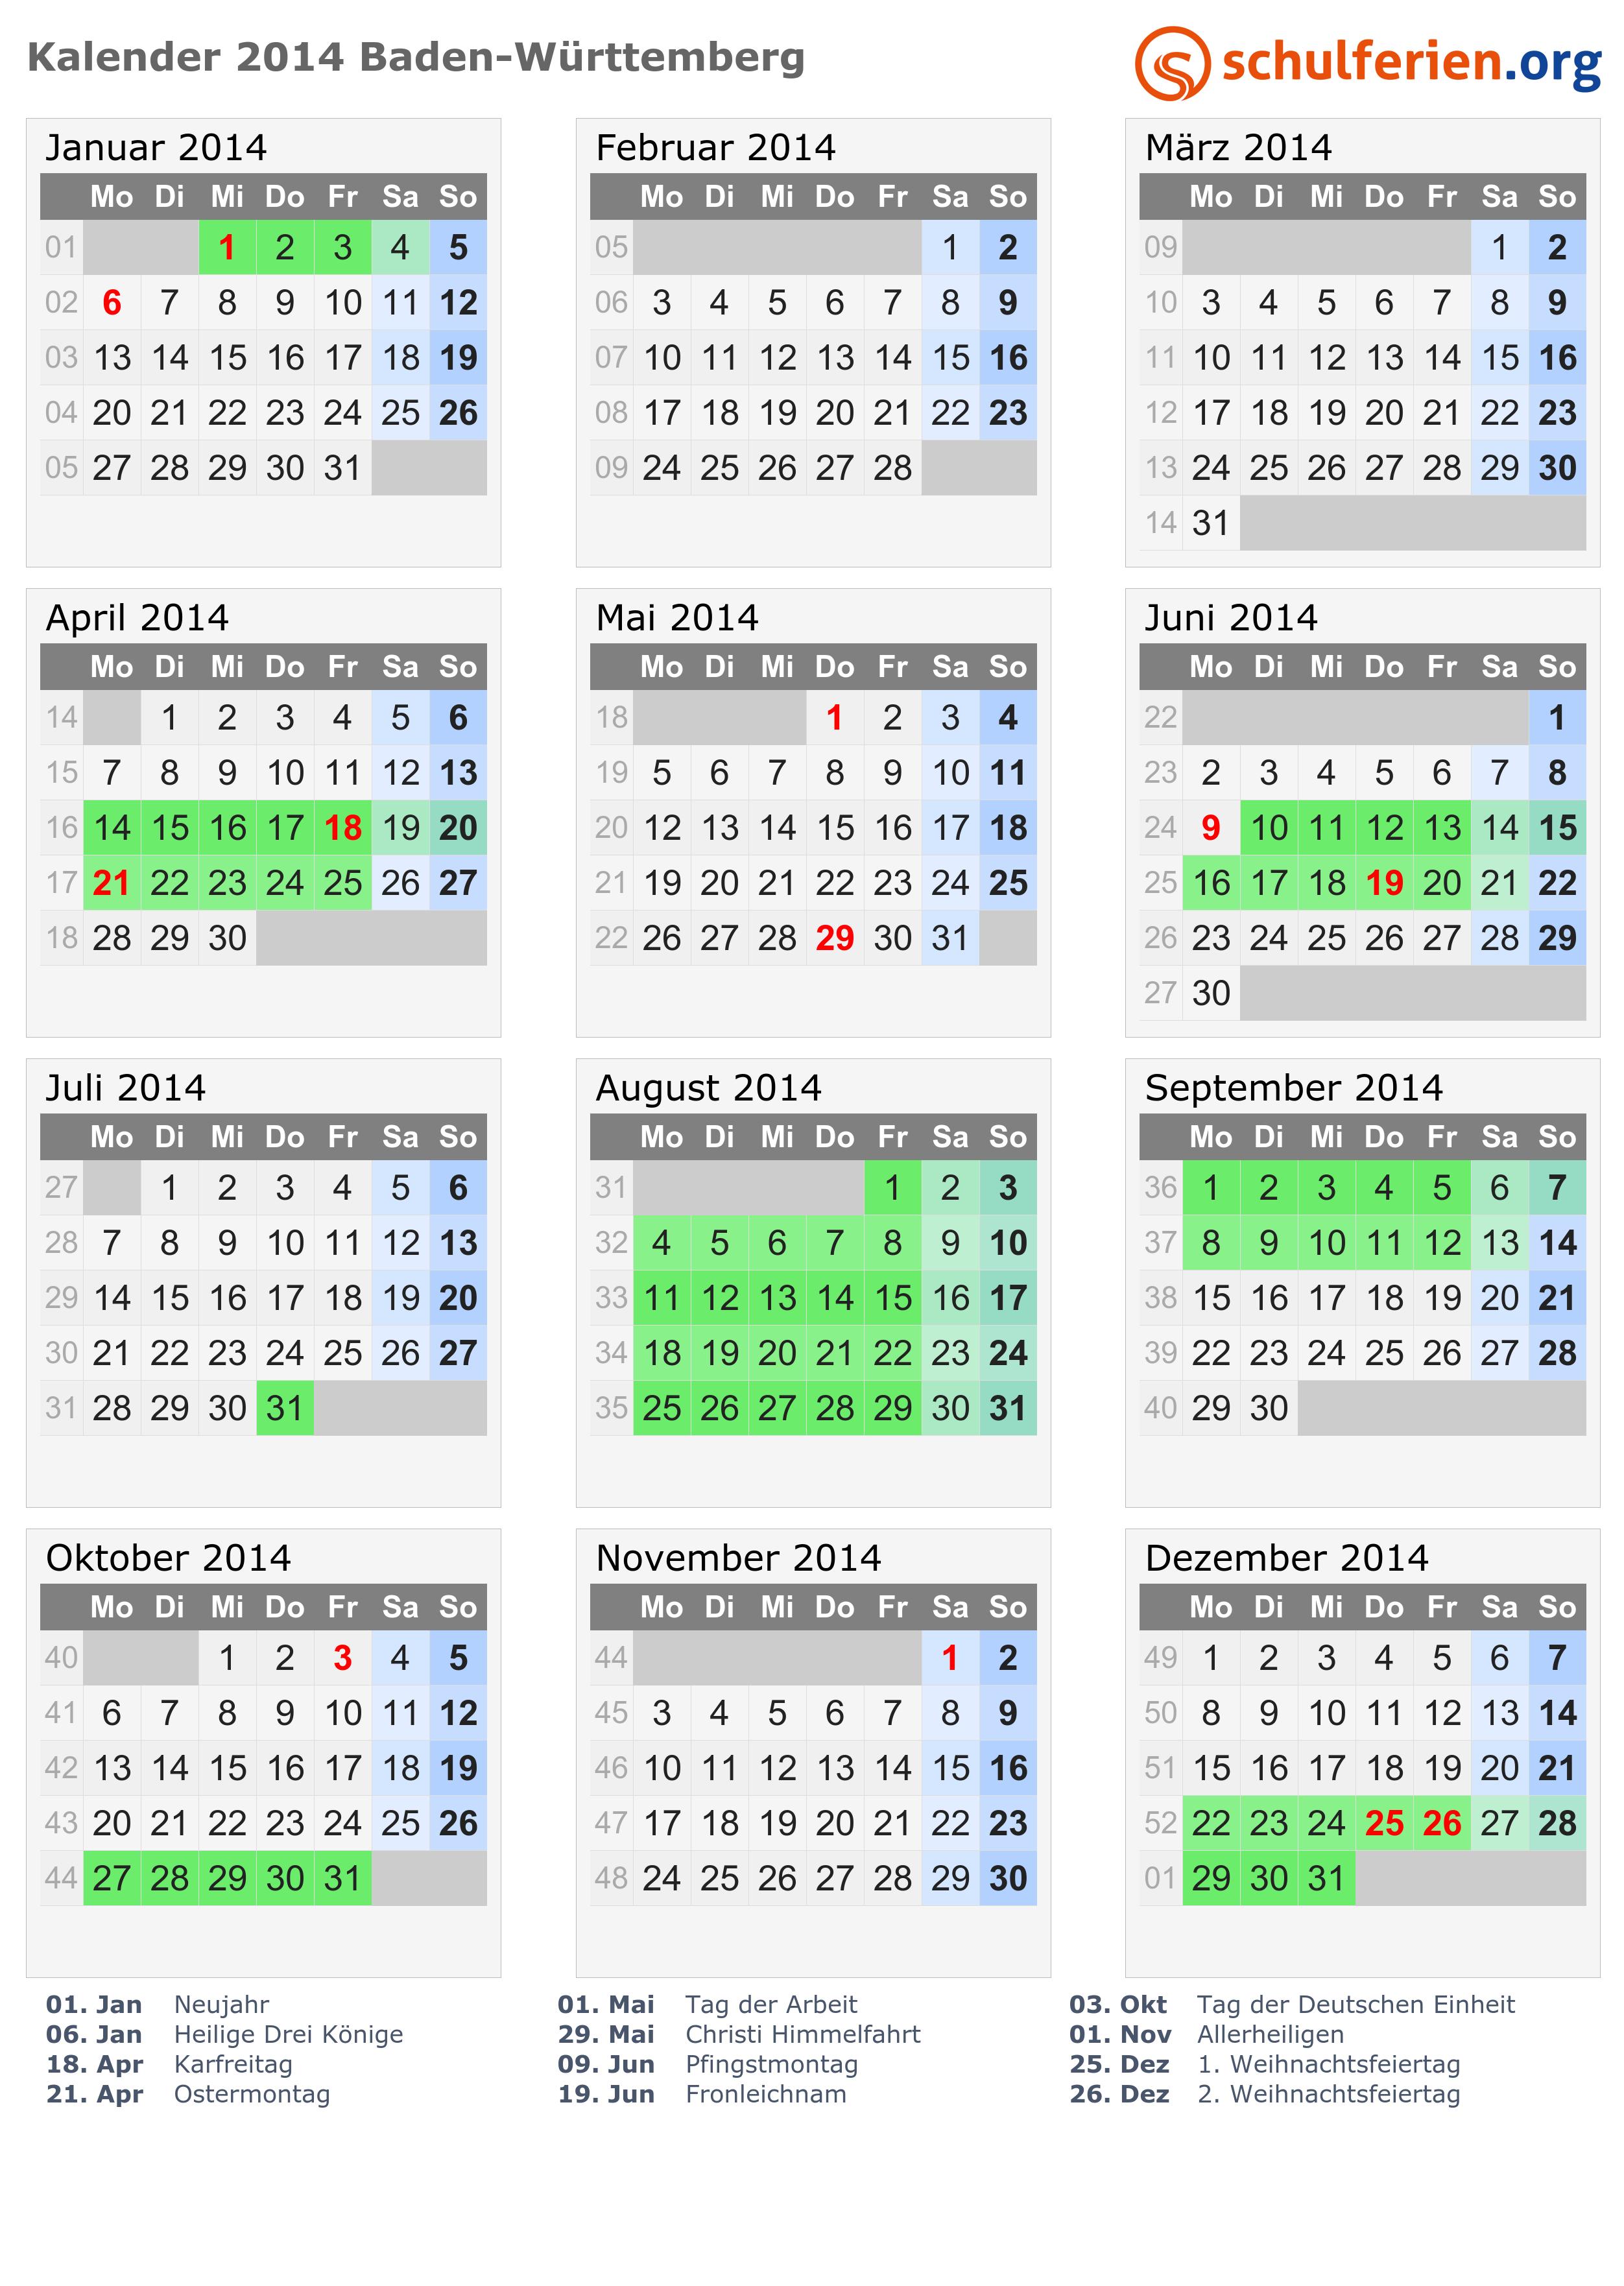 Kalender 2014 + Ferien Baden-Württemberg, Feiertage